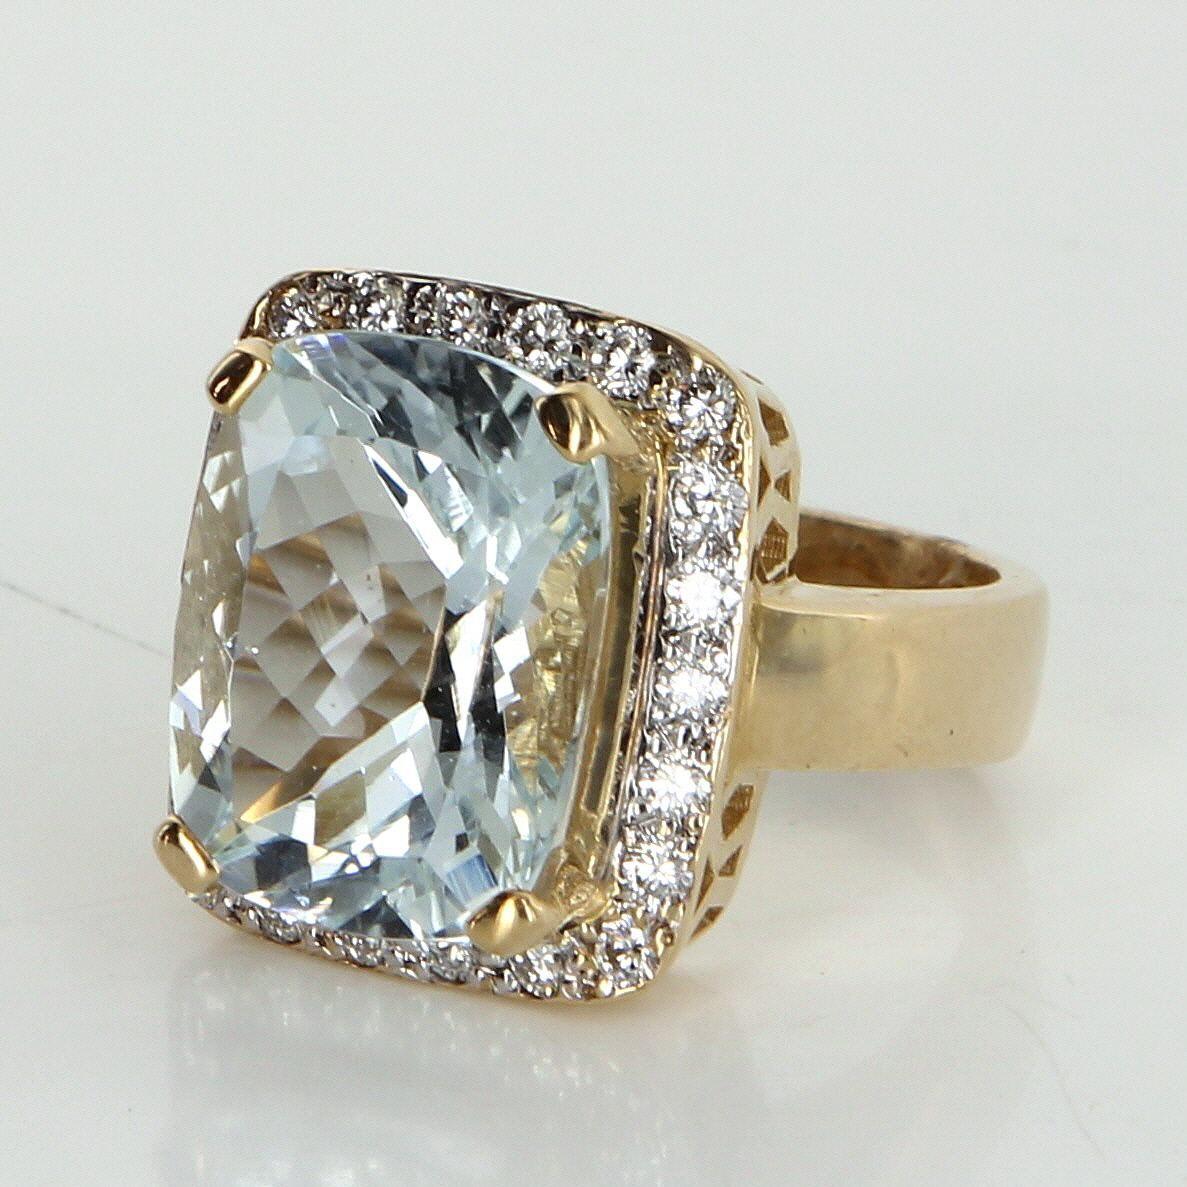 Aquamarine Diamond Cocktail Ring Vintage 14 Karat Gold Estate Fine